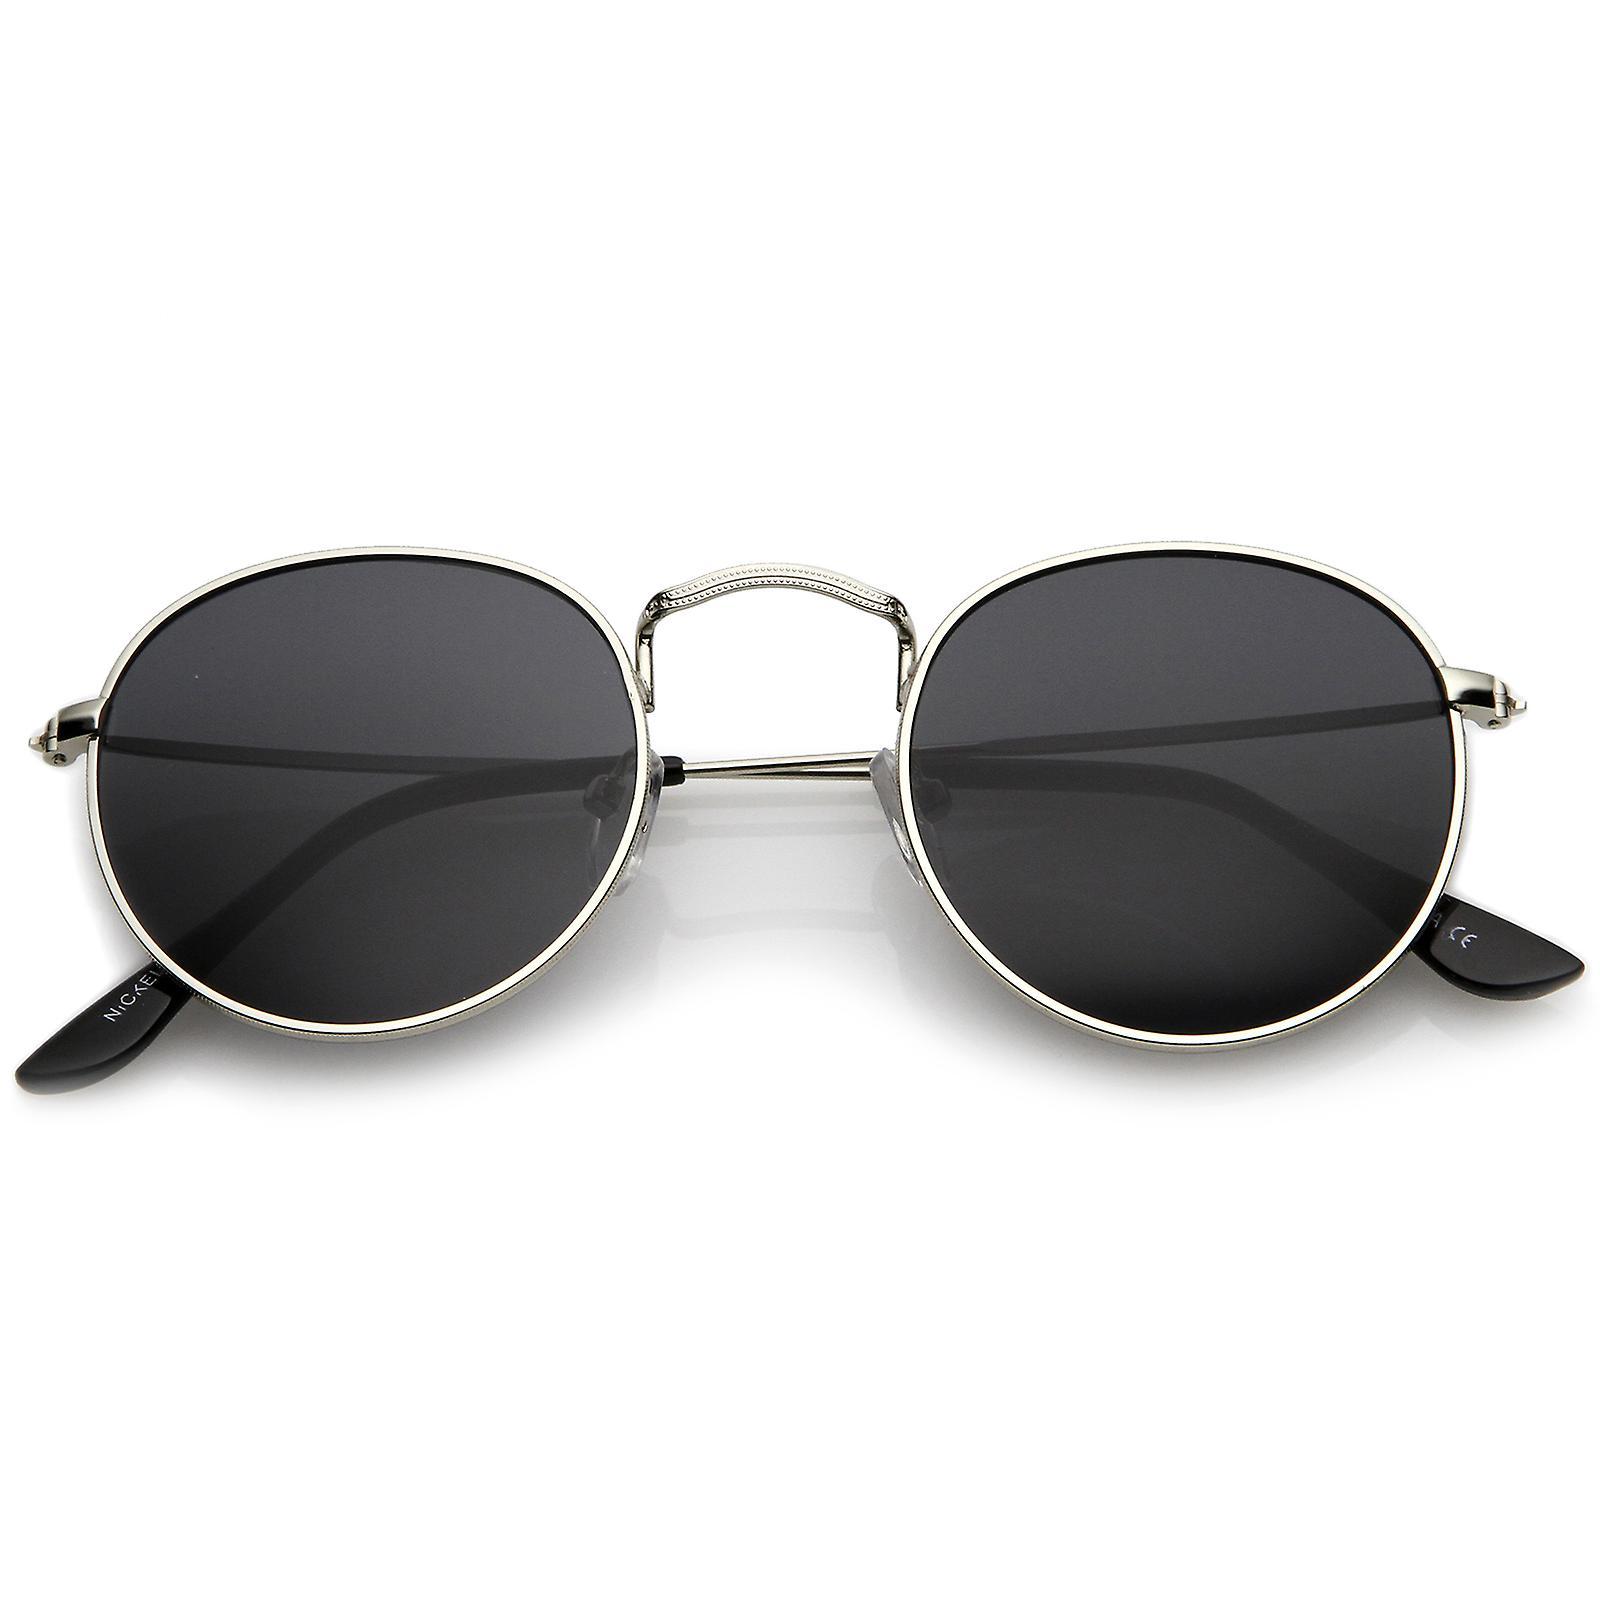 Classic Full Metal Frame Slim Temple Round Sunglasses 45mm | Fruugo